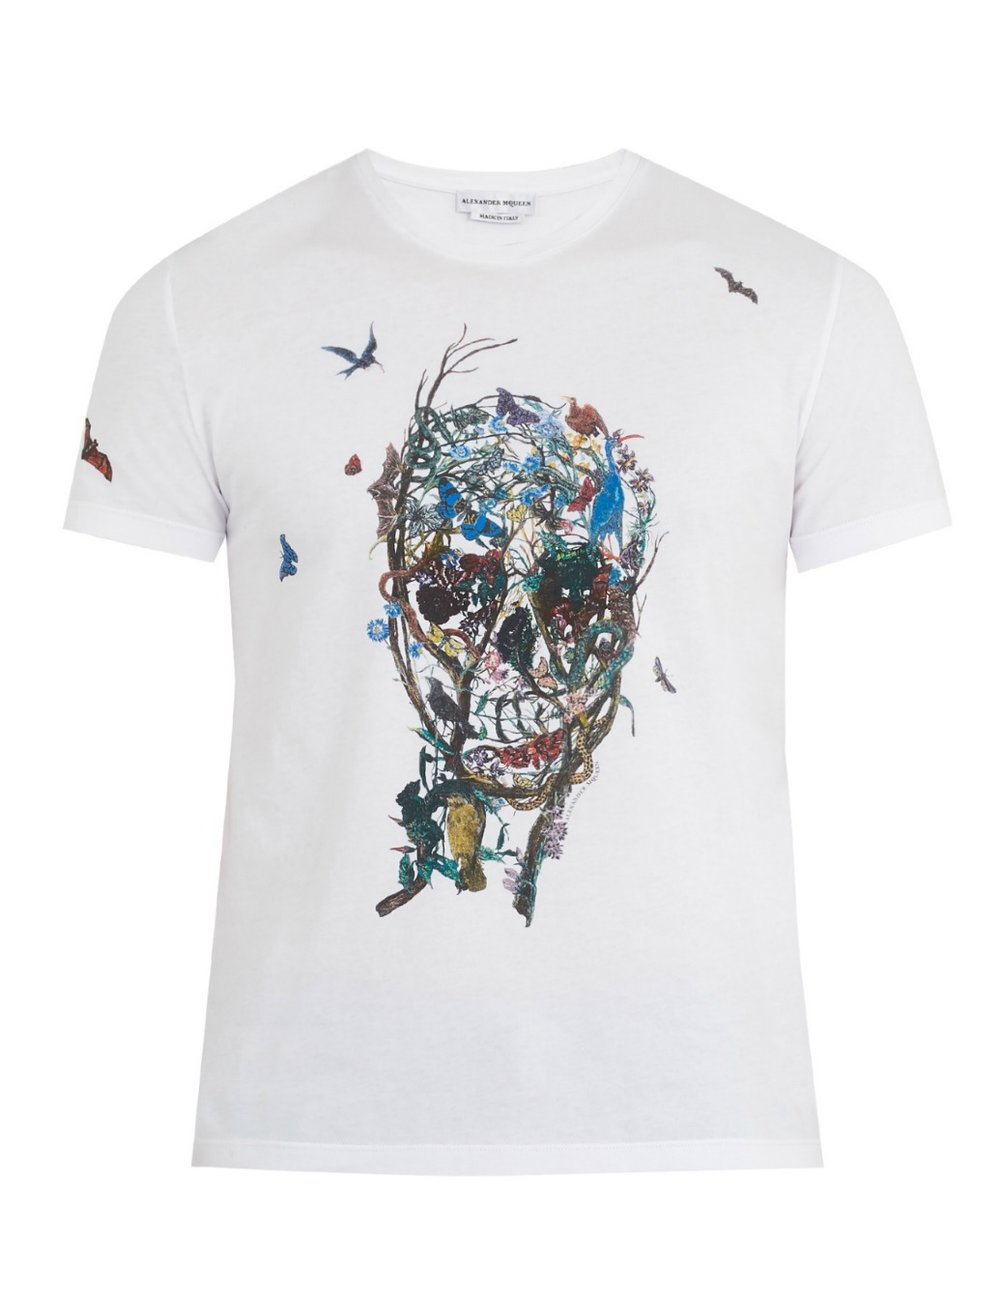 ALEXANDER MCQUEENSkull-print cotton-jersey tshirt - MATCHESFASHION.COM